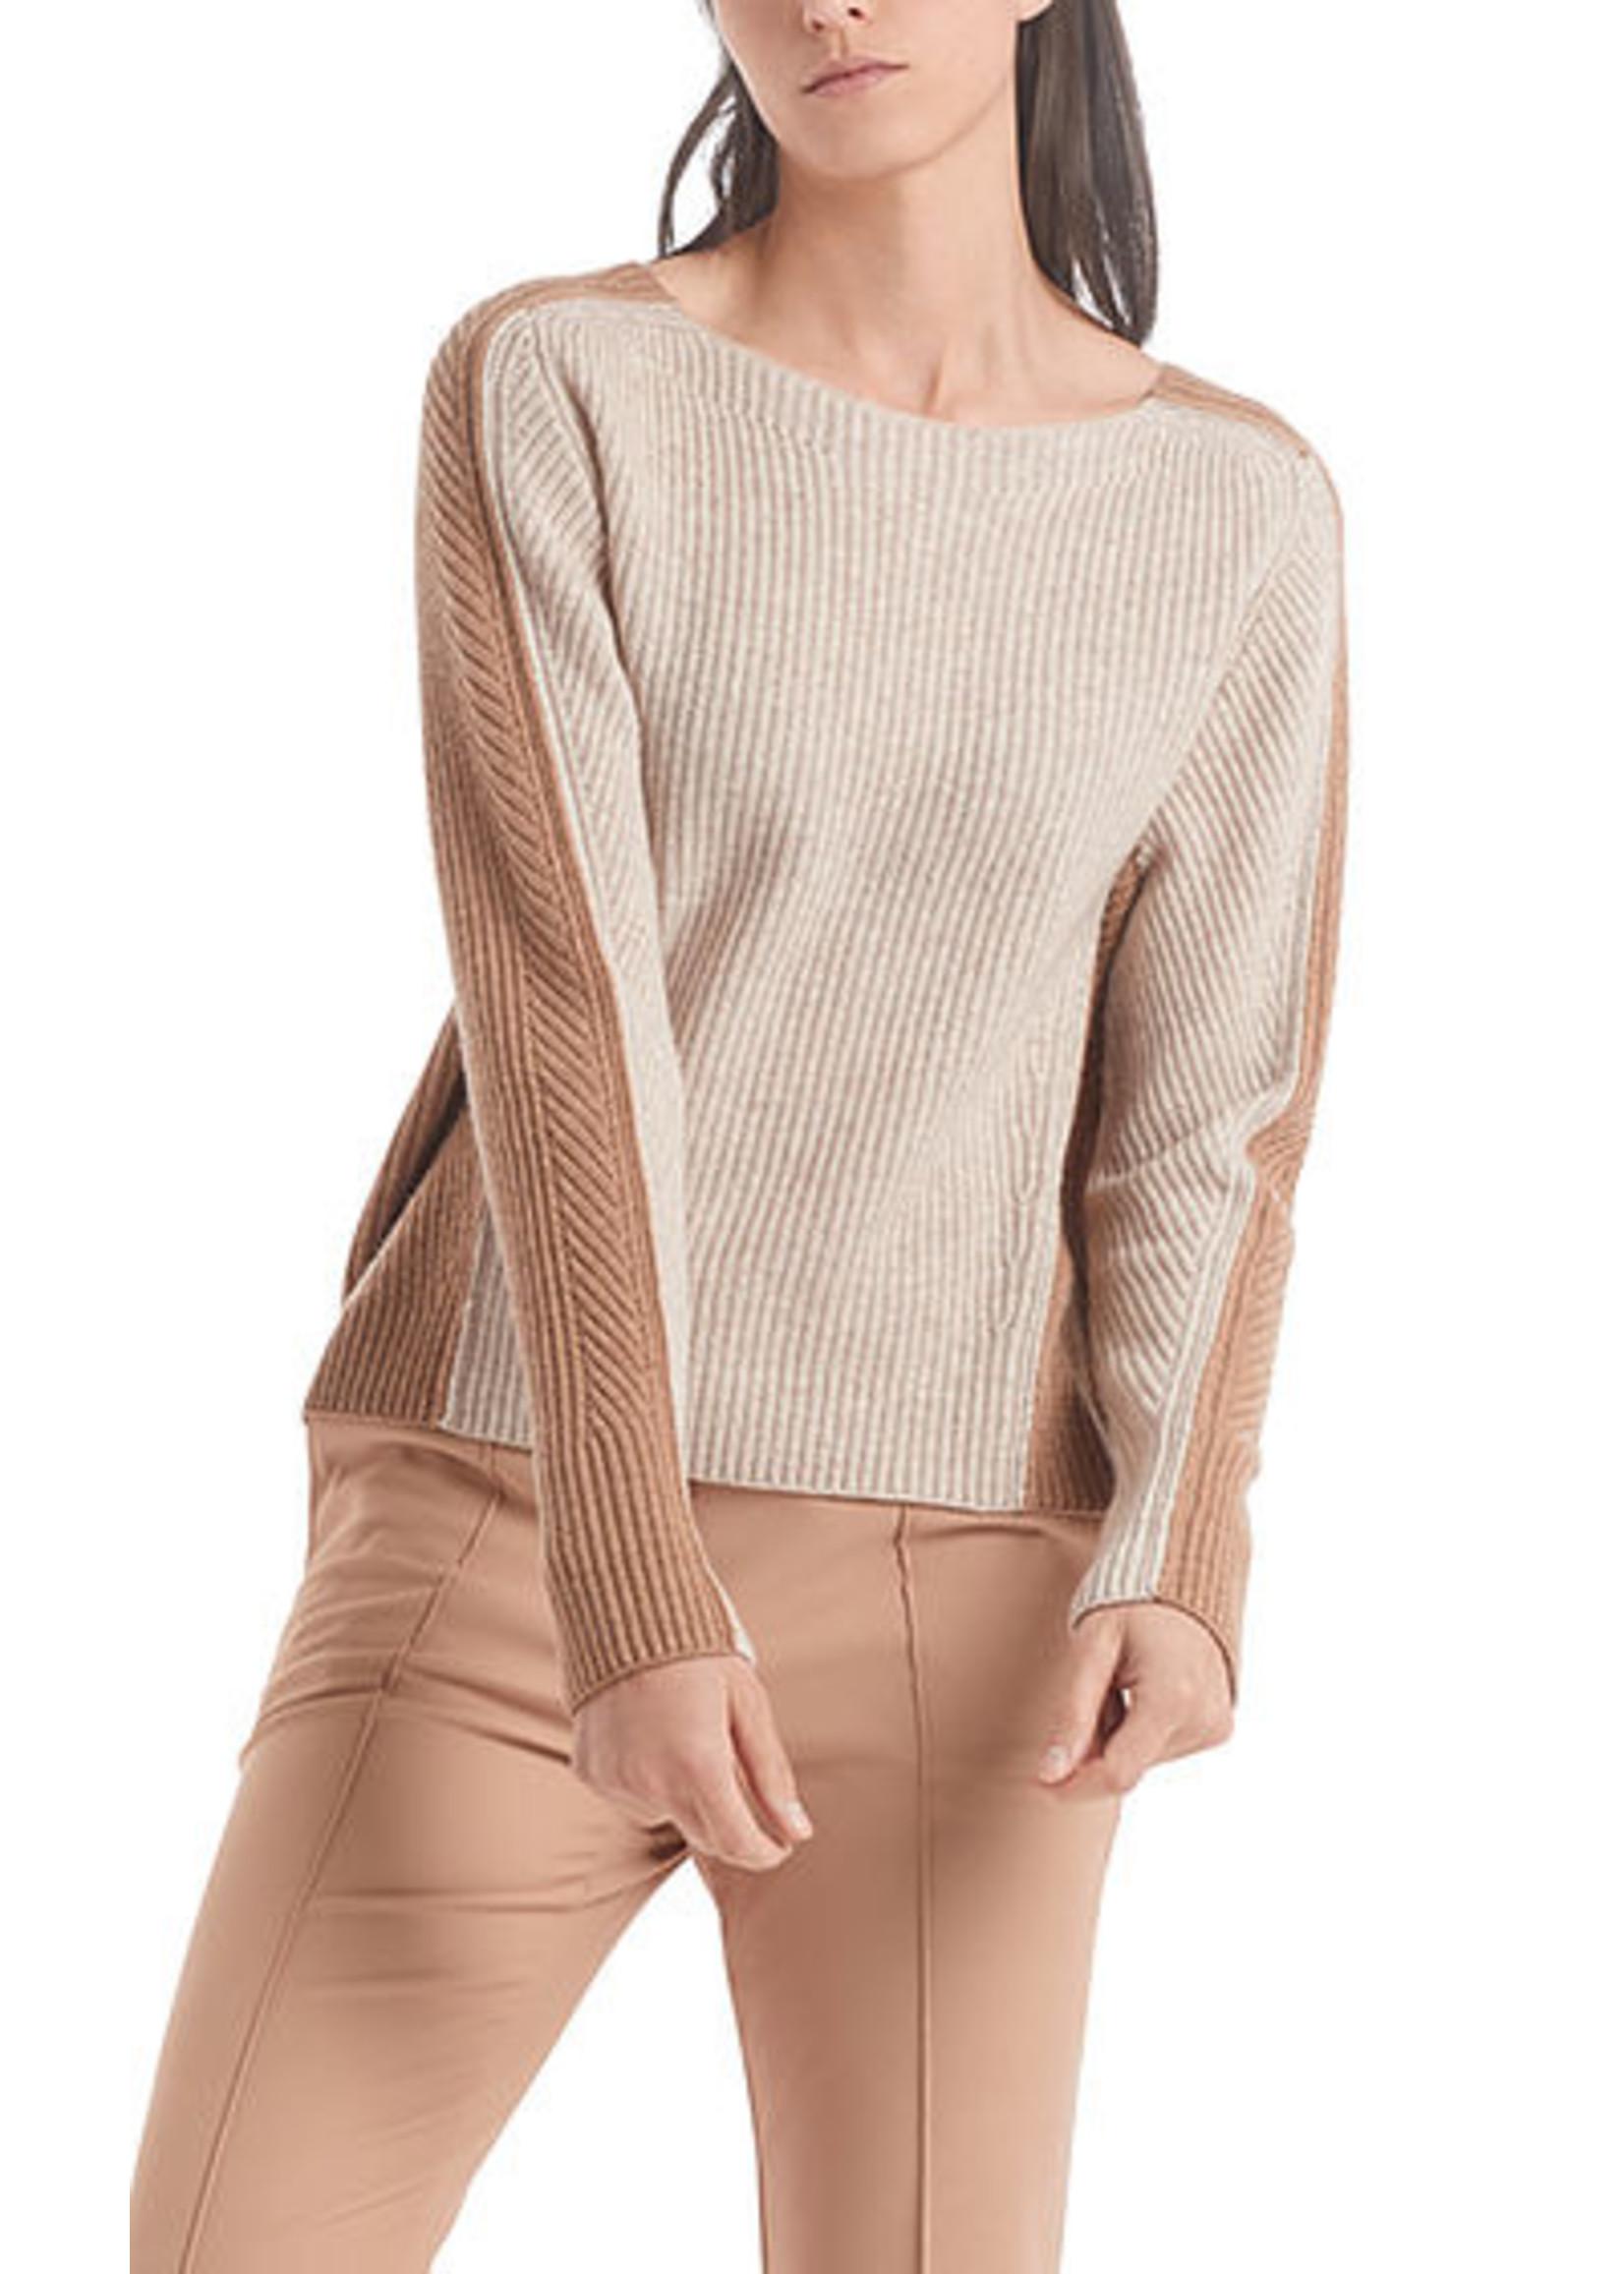 Sweater RA 41.10 M85 bisque